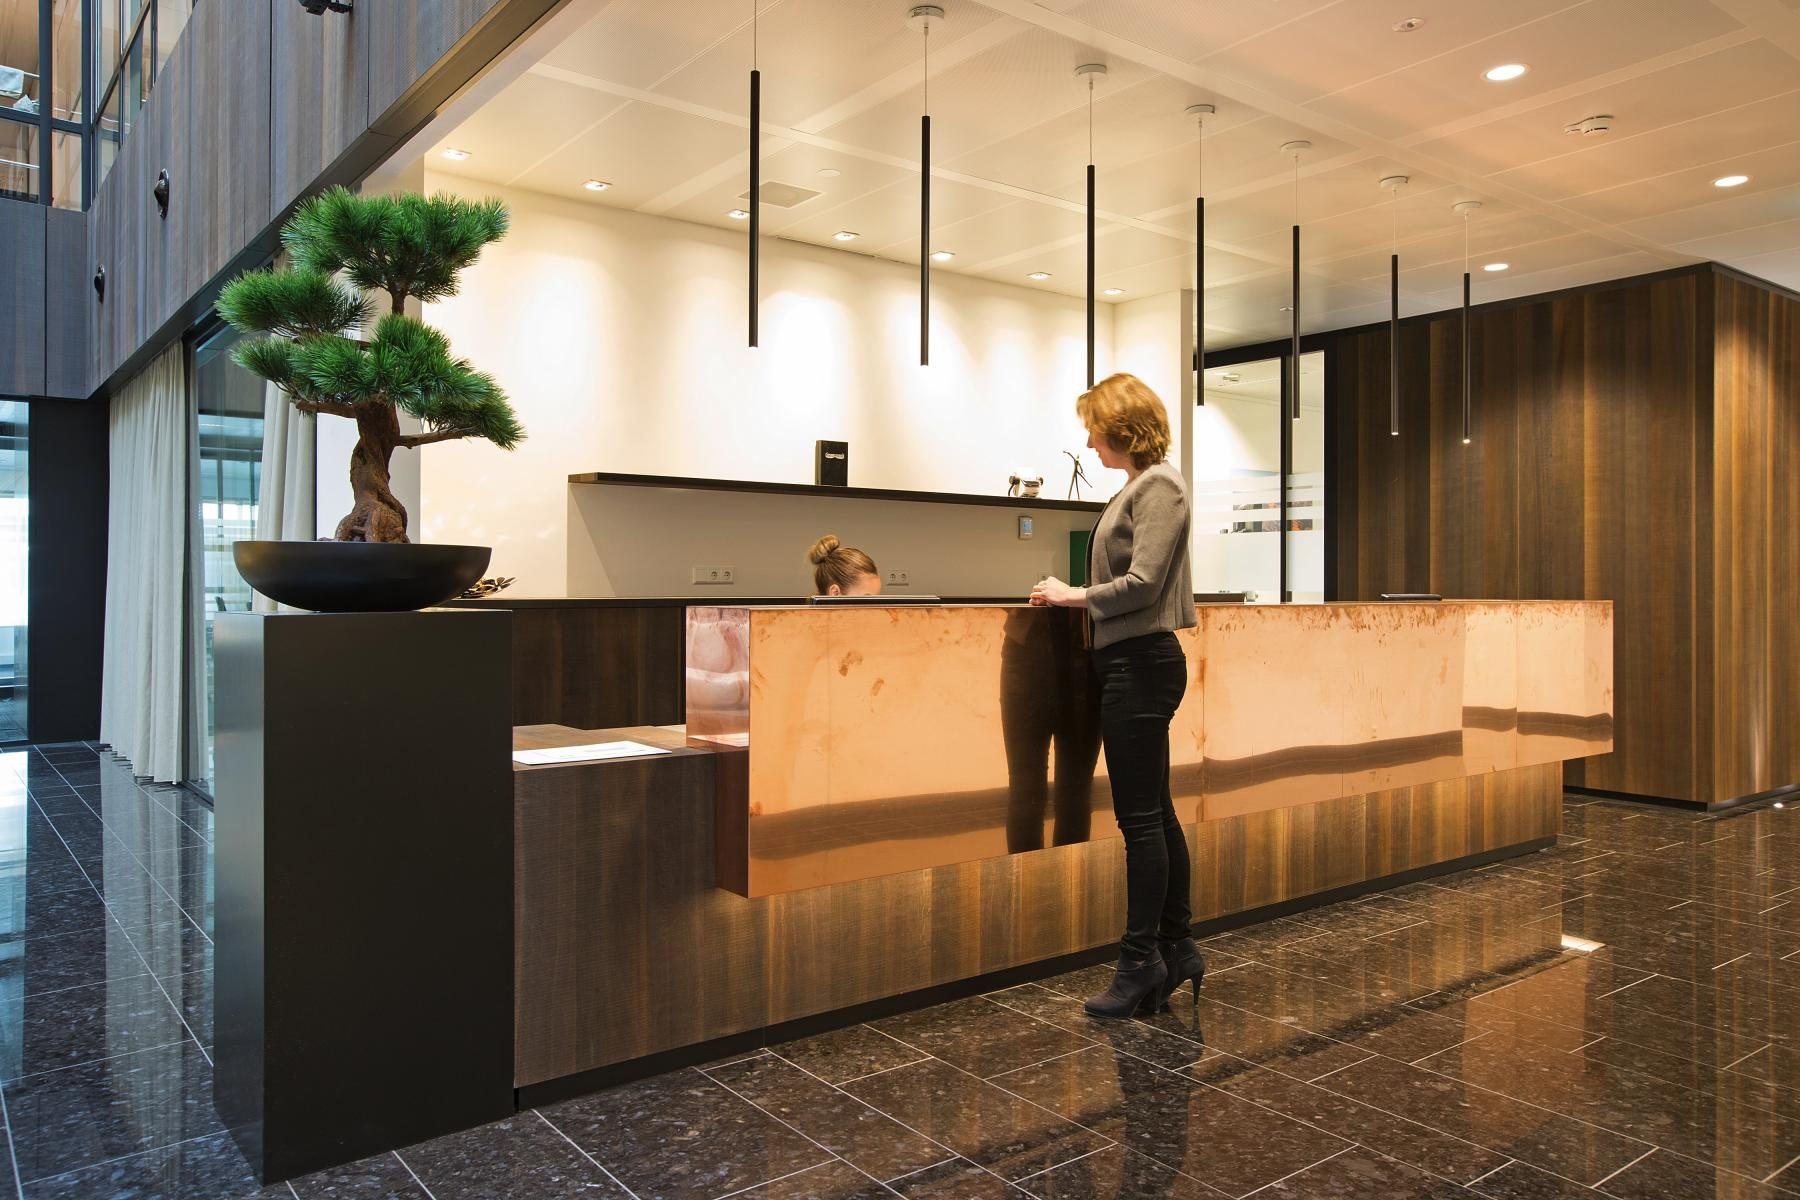 receptiebalie receptionisten planten personen huur kantoorruimte amsterdam zuid